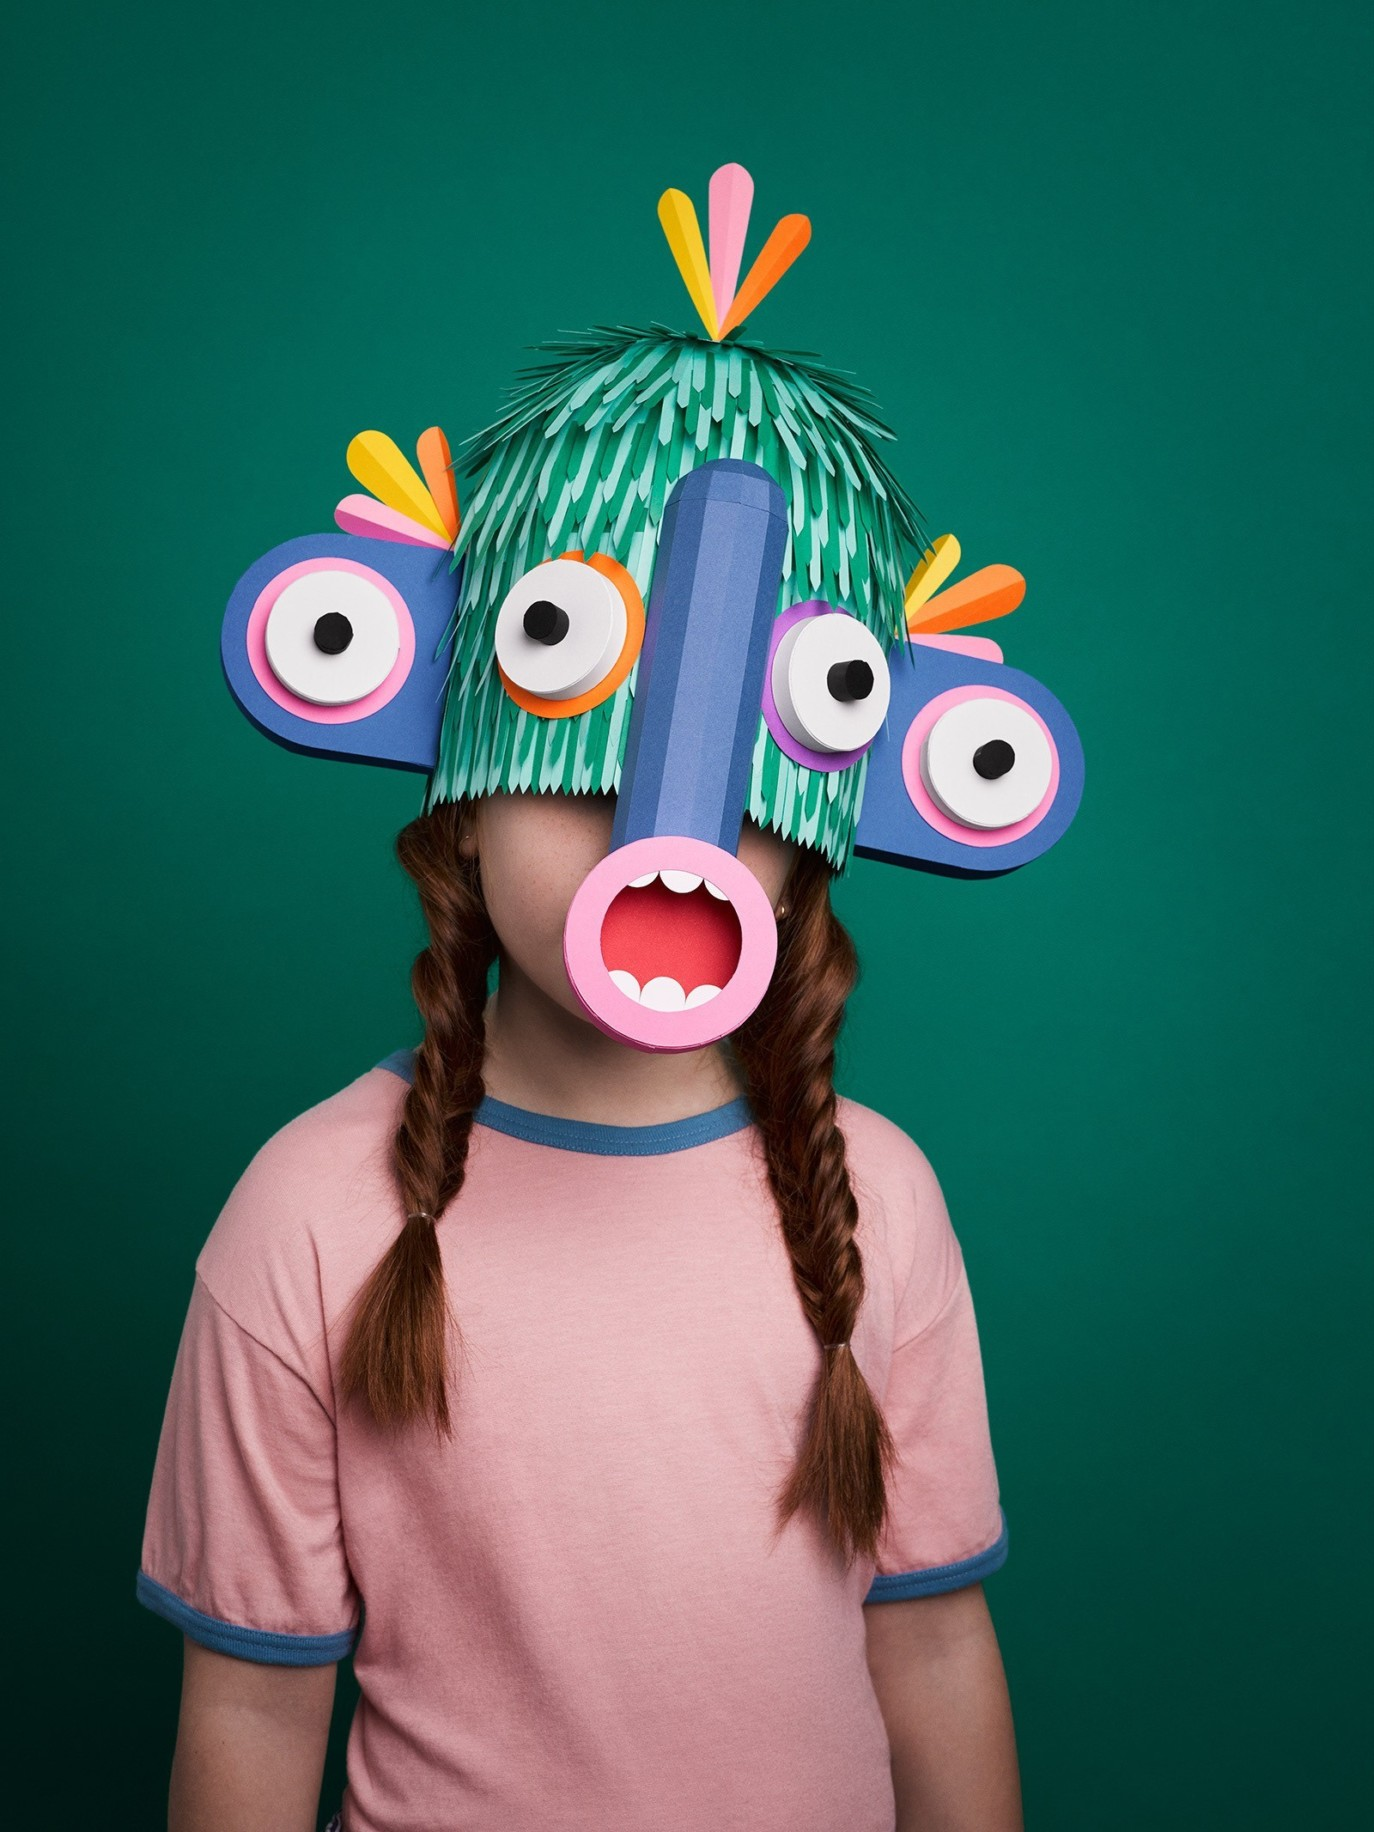 lobulo-mask-1-687x916@2x